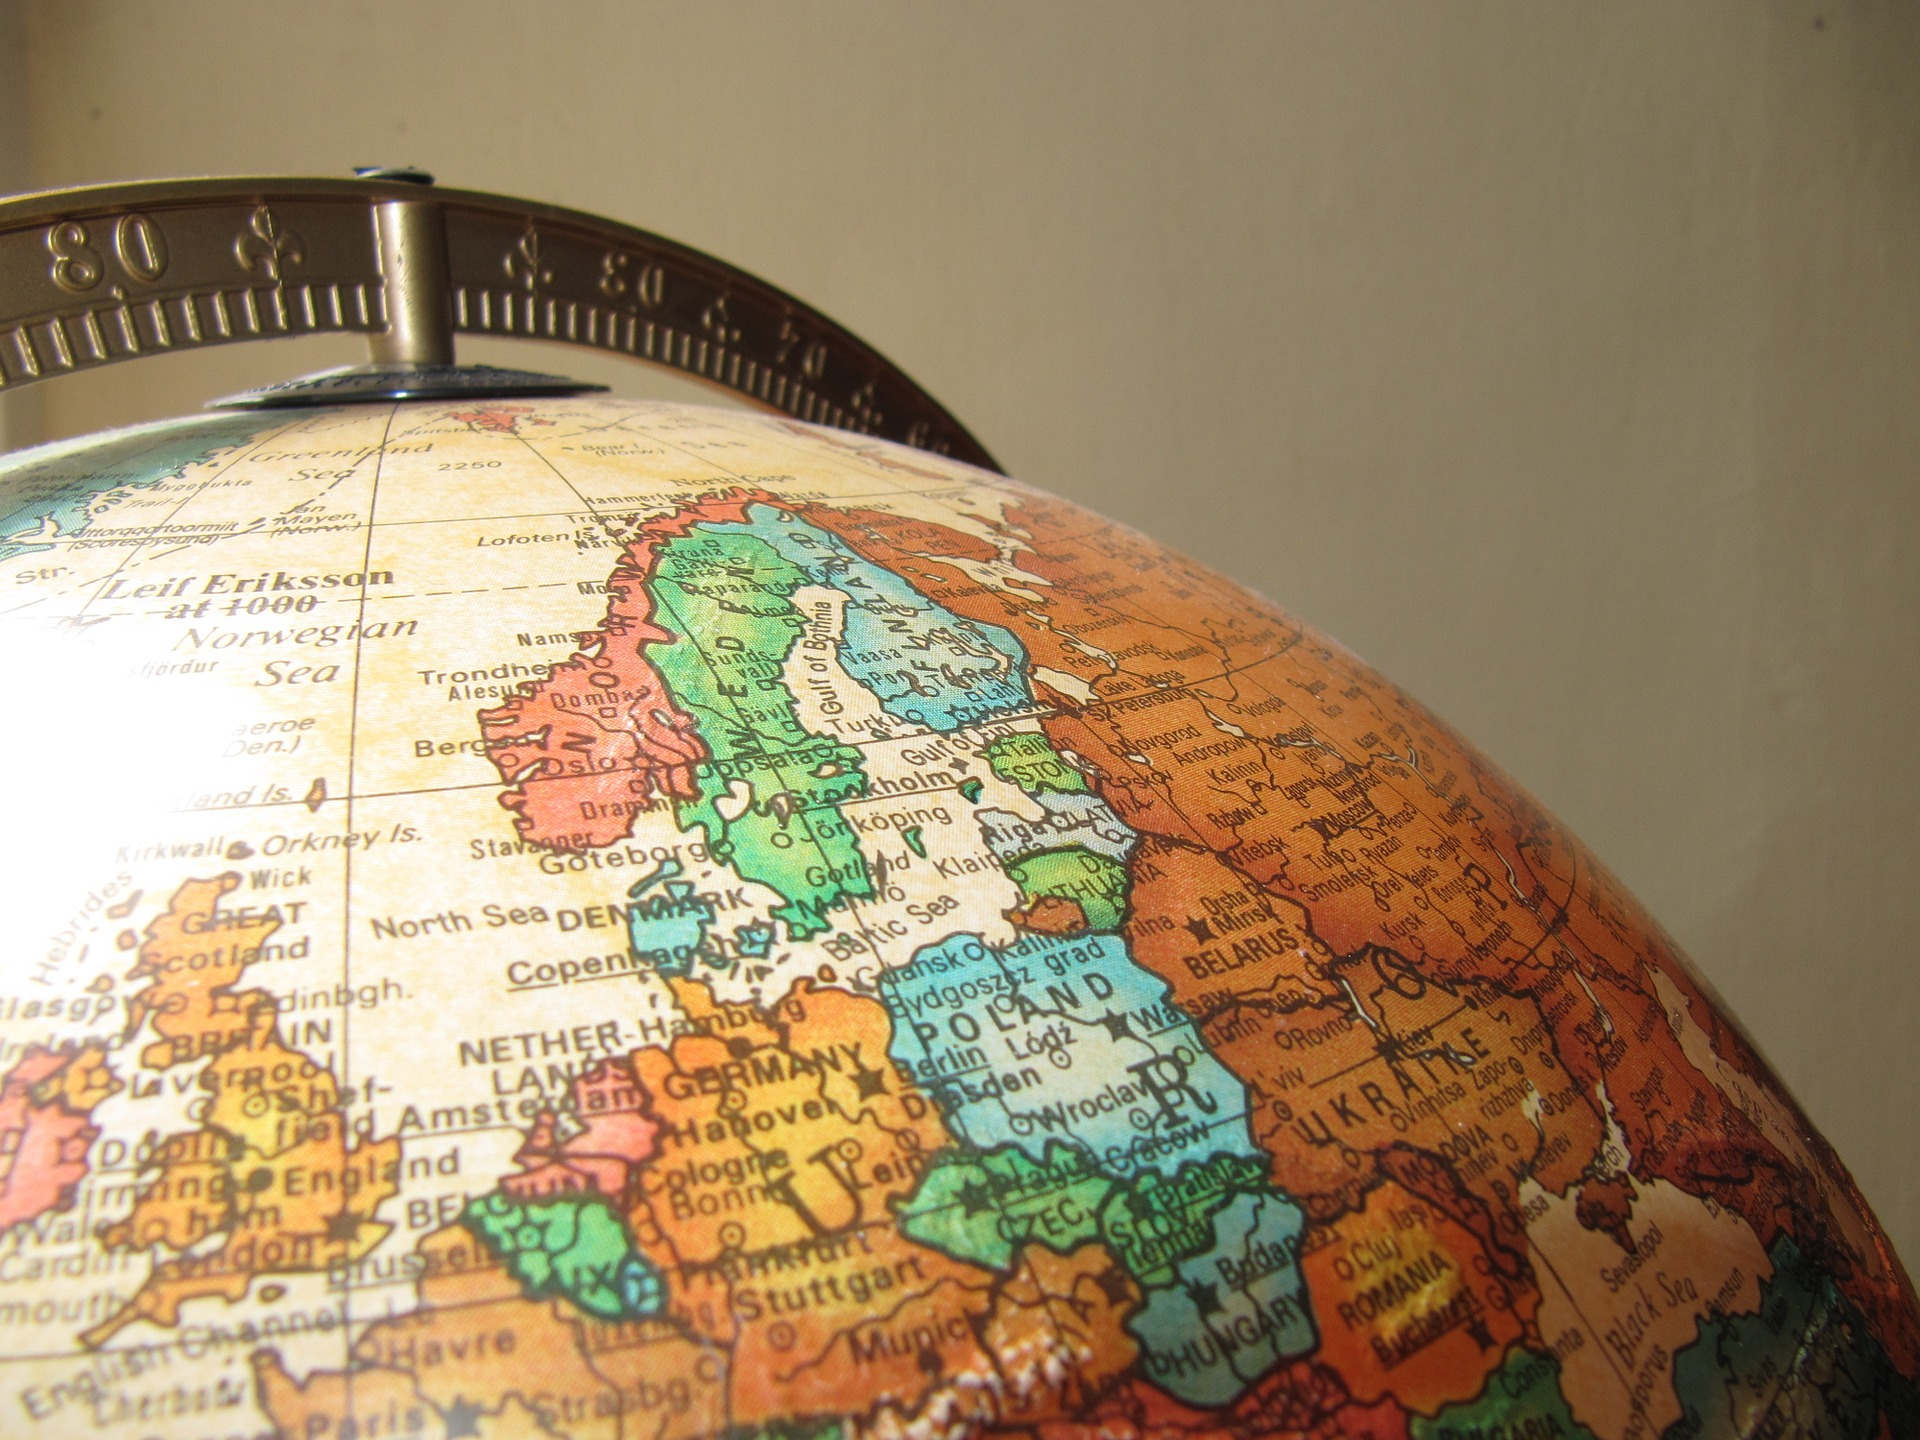 International travel grew by 7% last year, says UNWTO